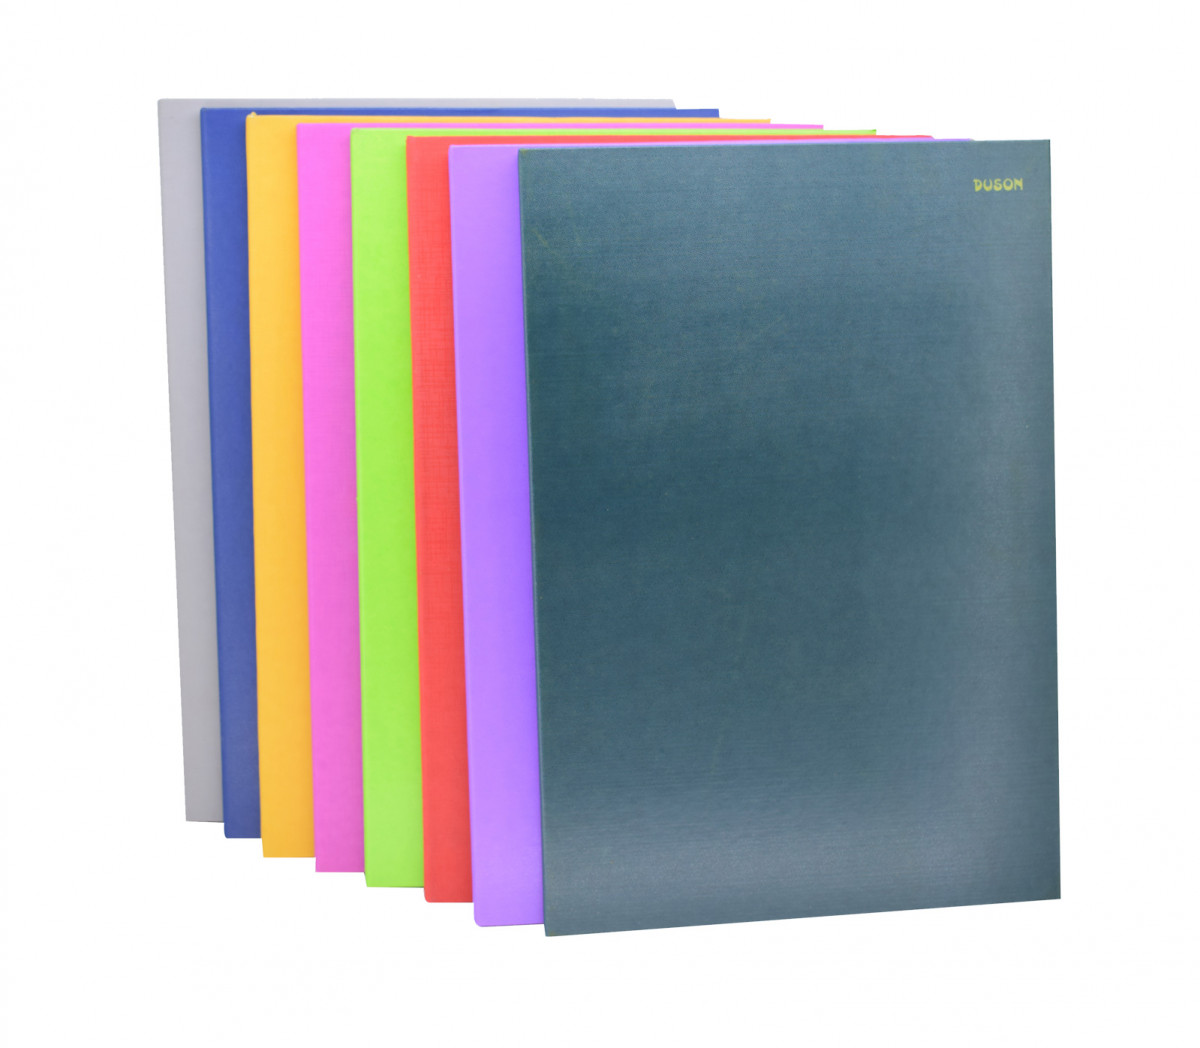 Carpeta archivadora tapa dura plastificada